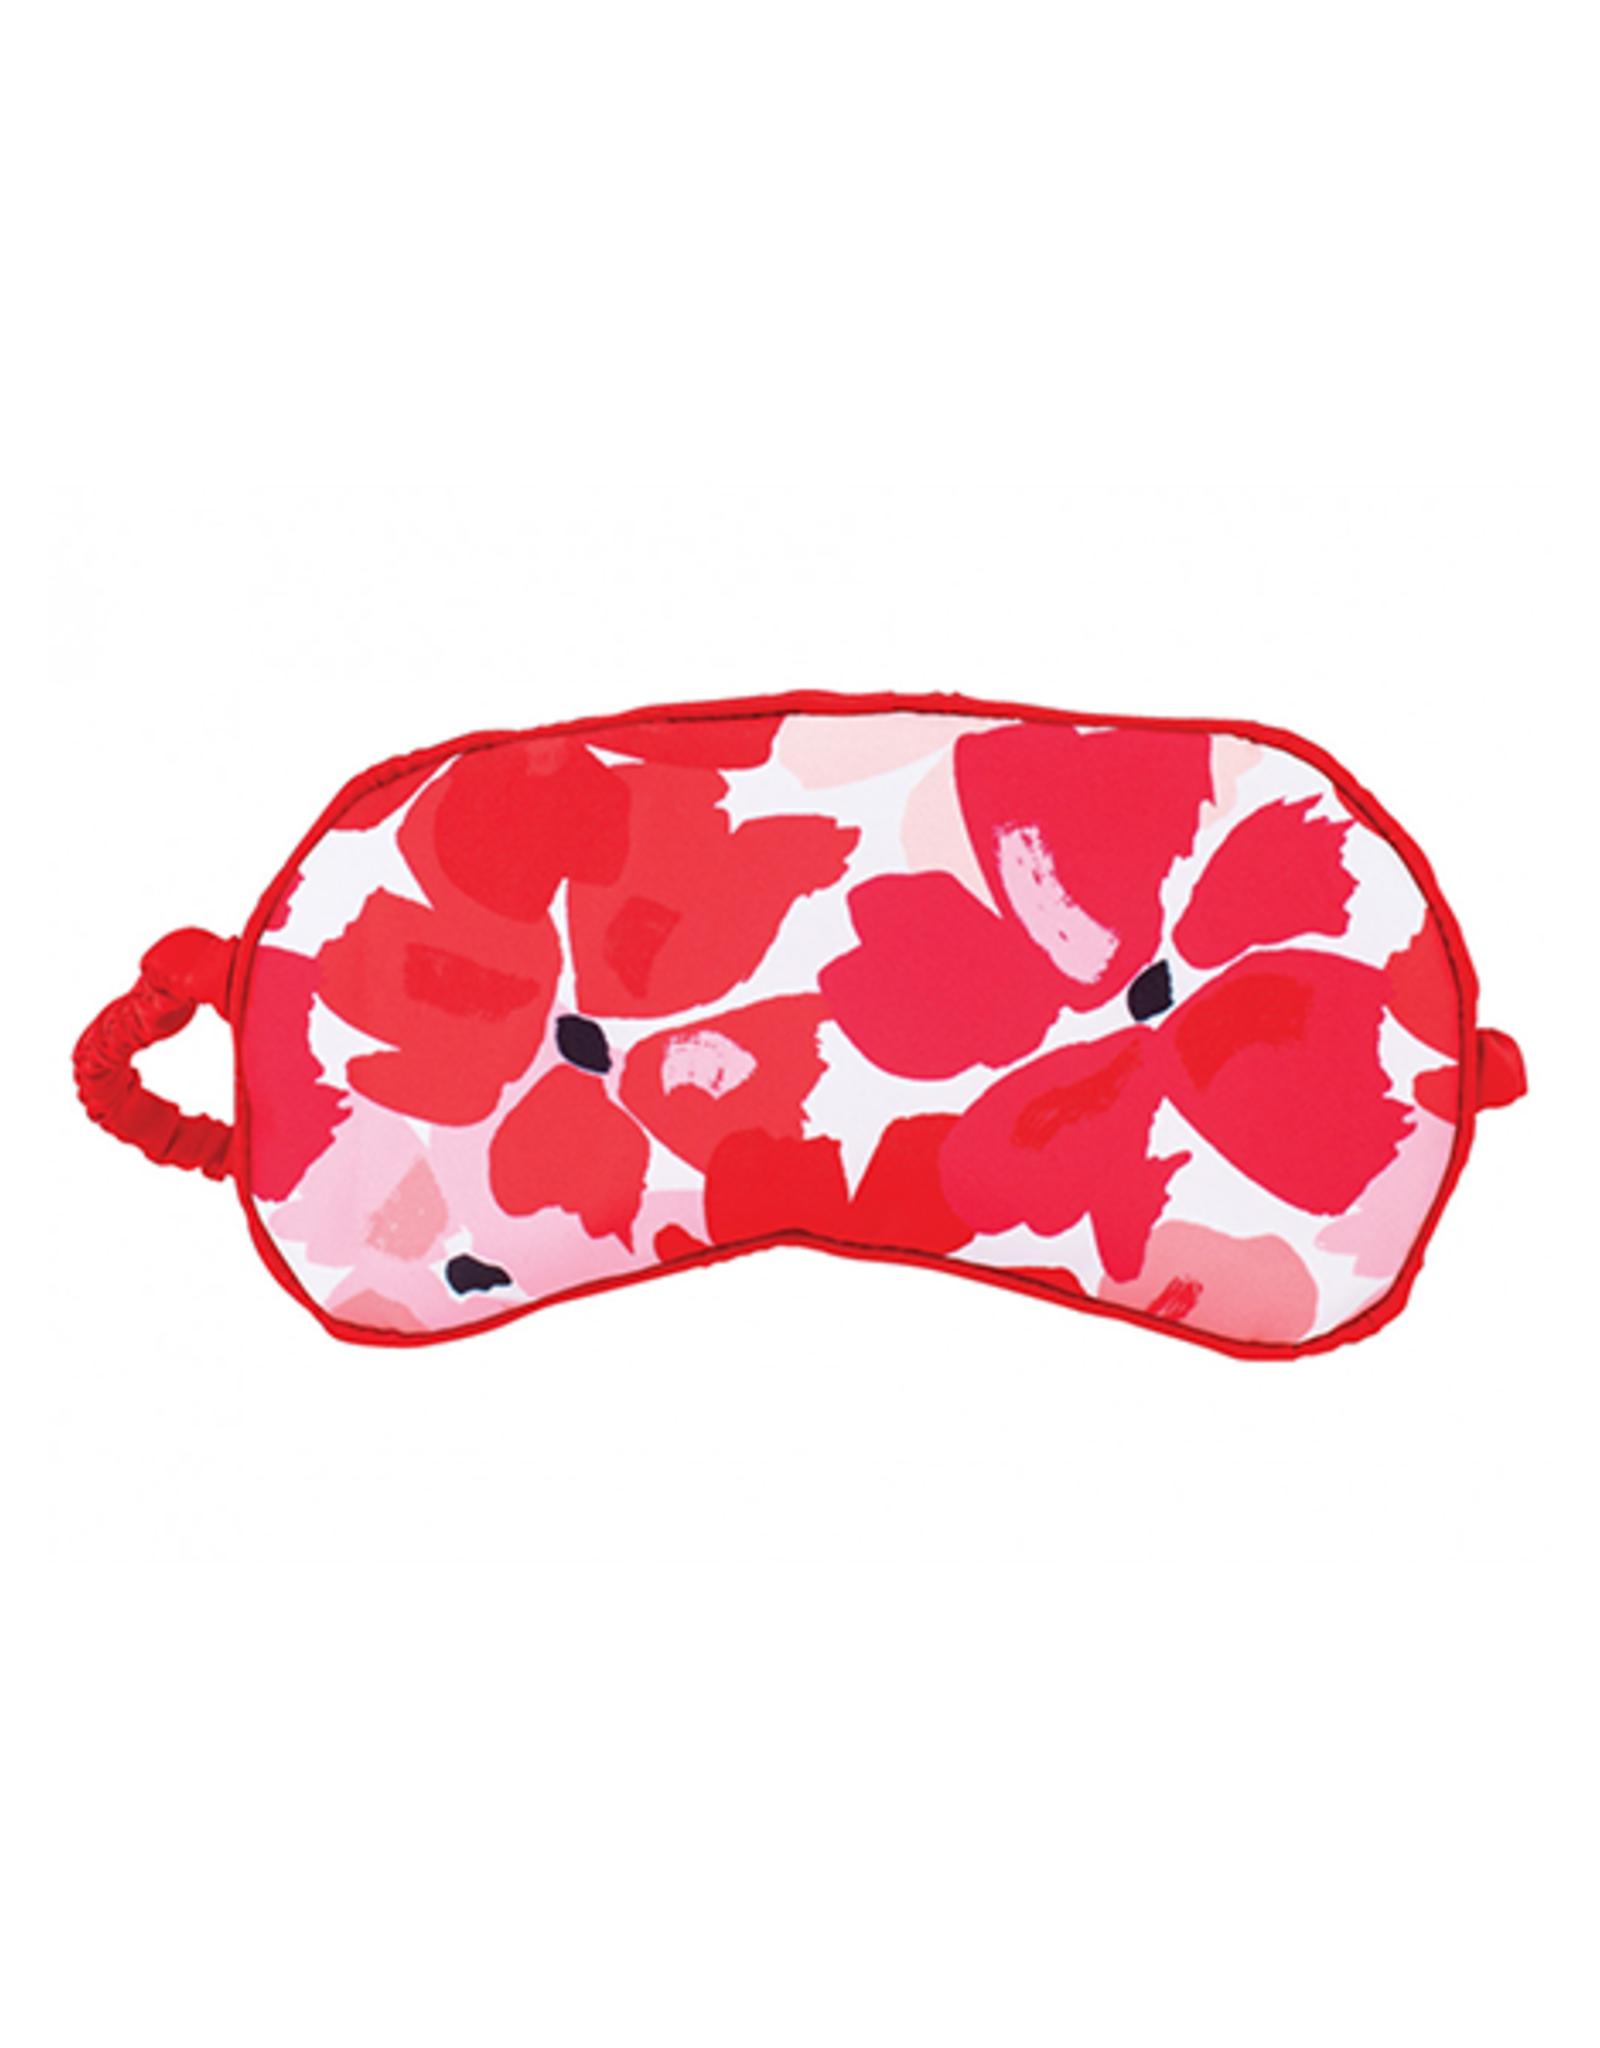 Pamper Pretty in Pink Eye Mask